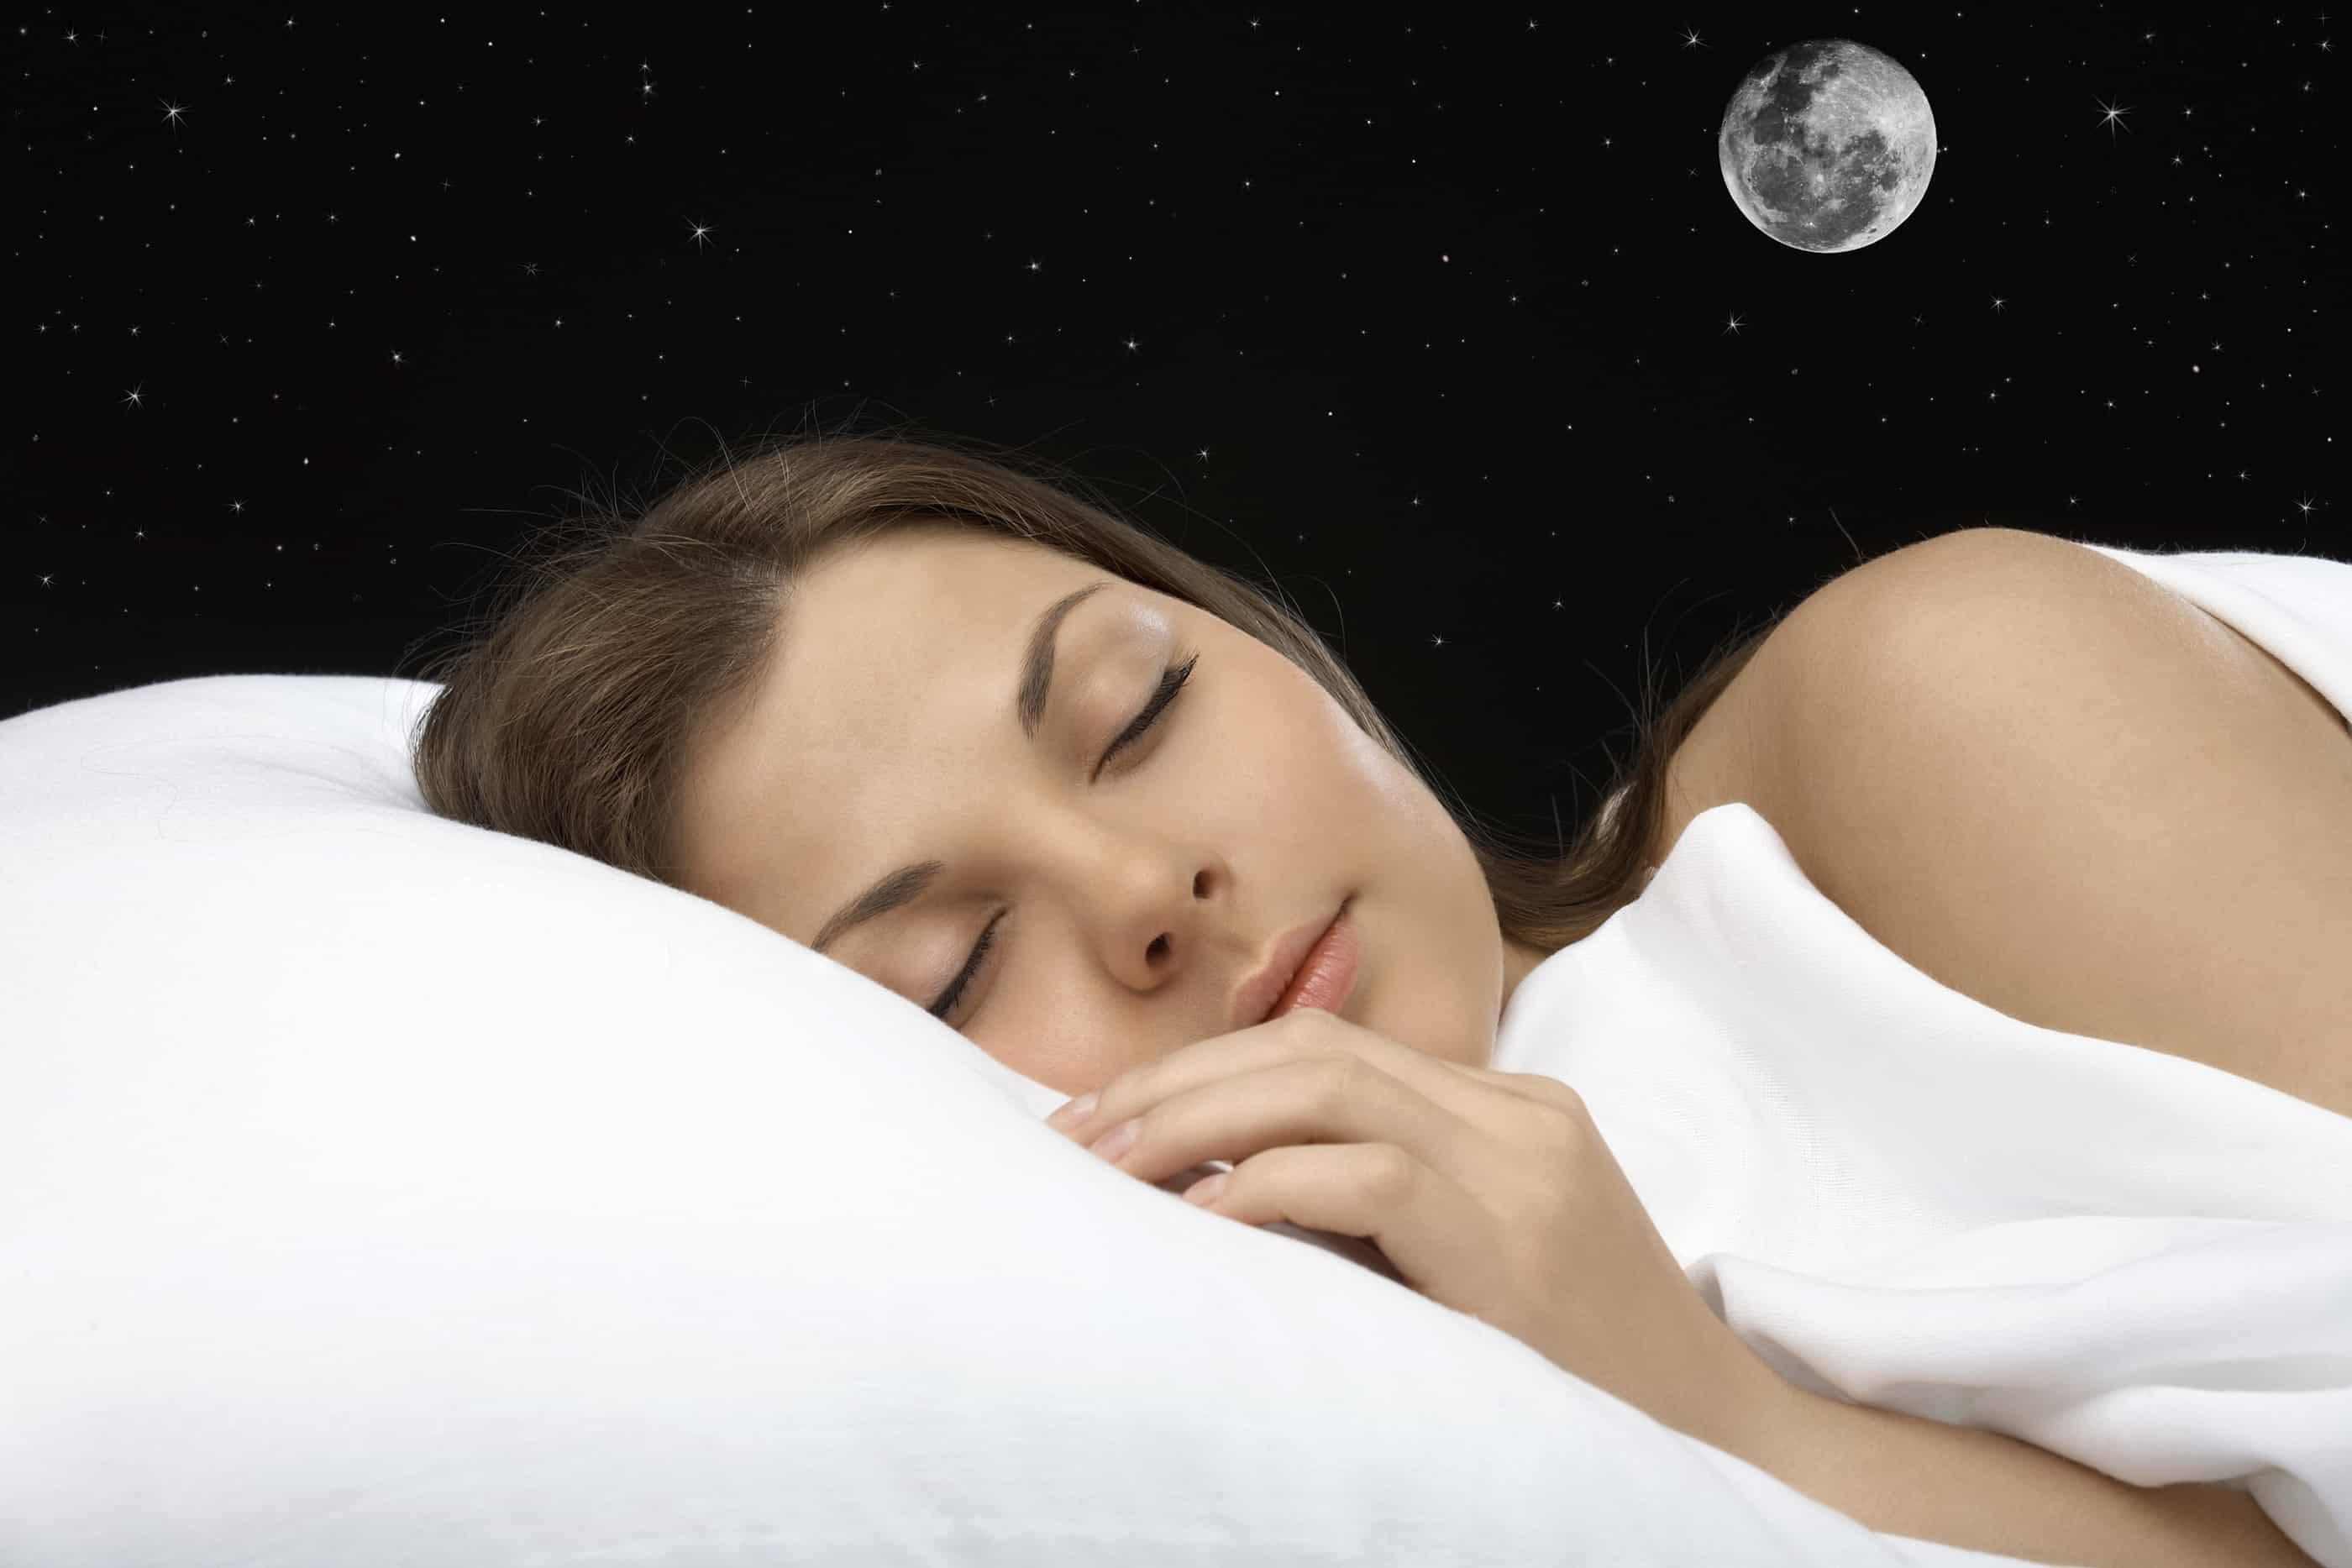 How To Sleep Better: Tips To Fall Asleep Fast